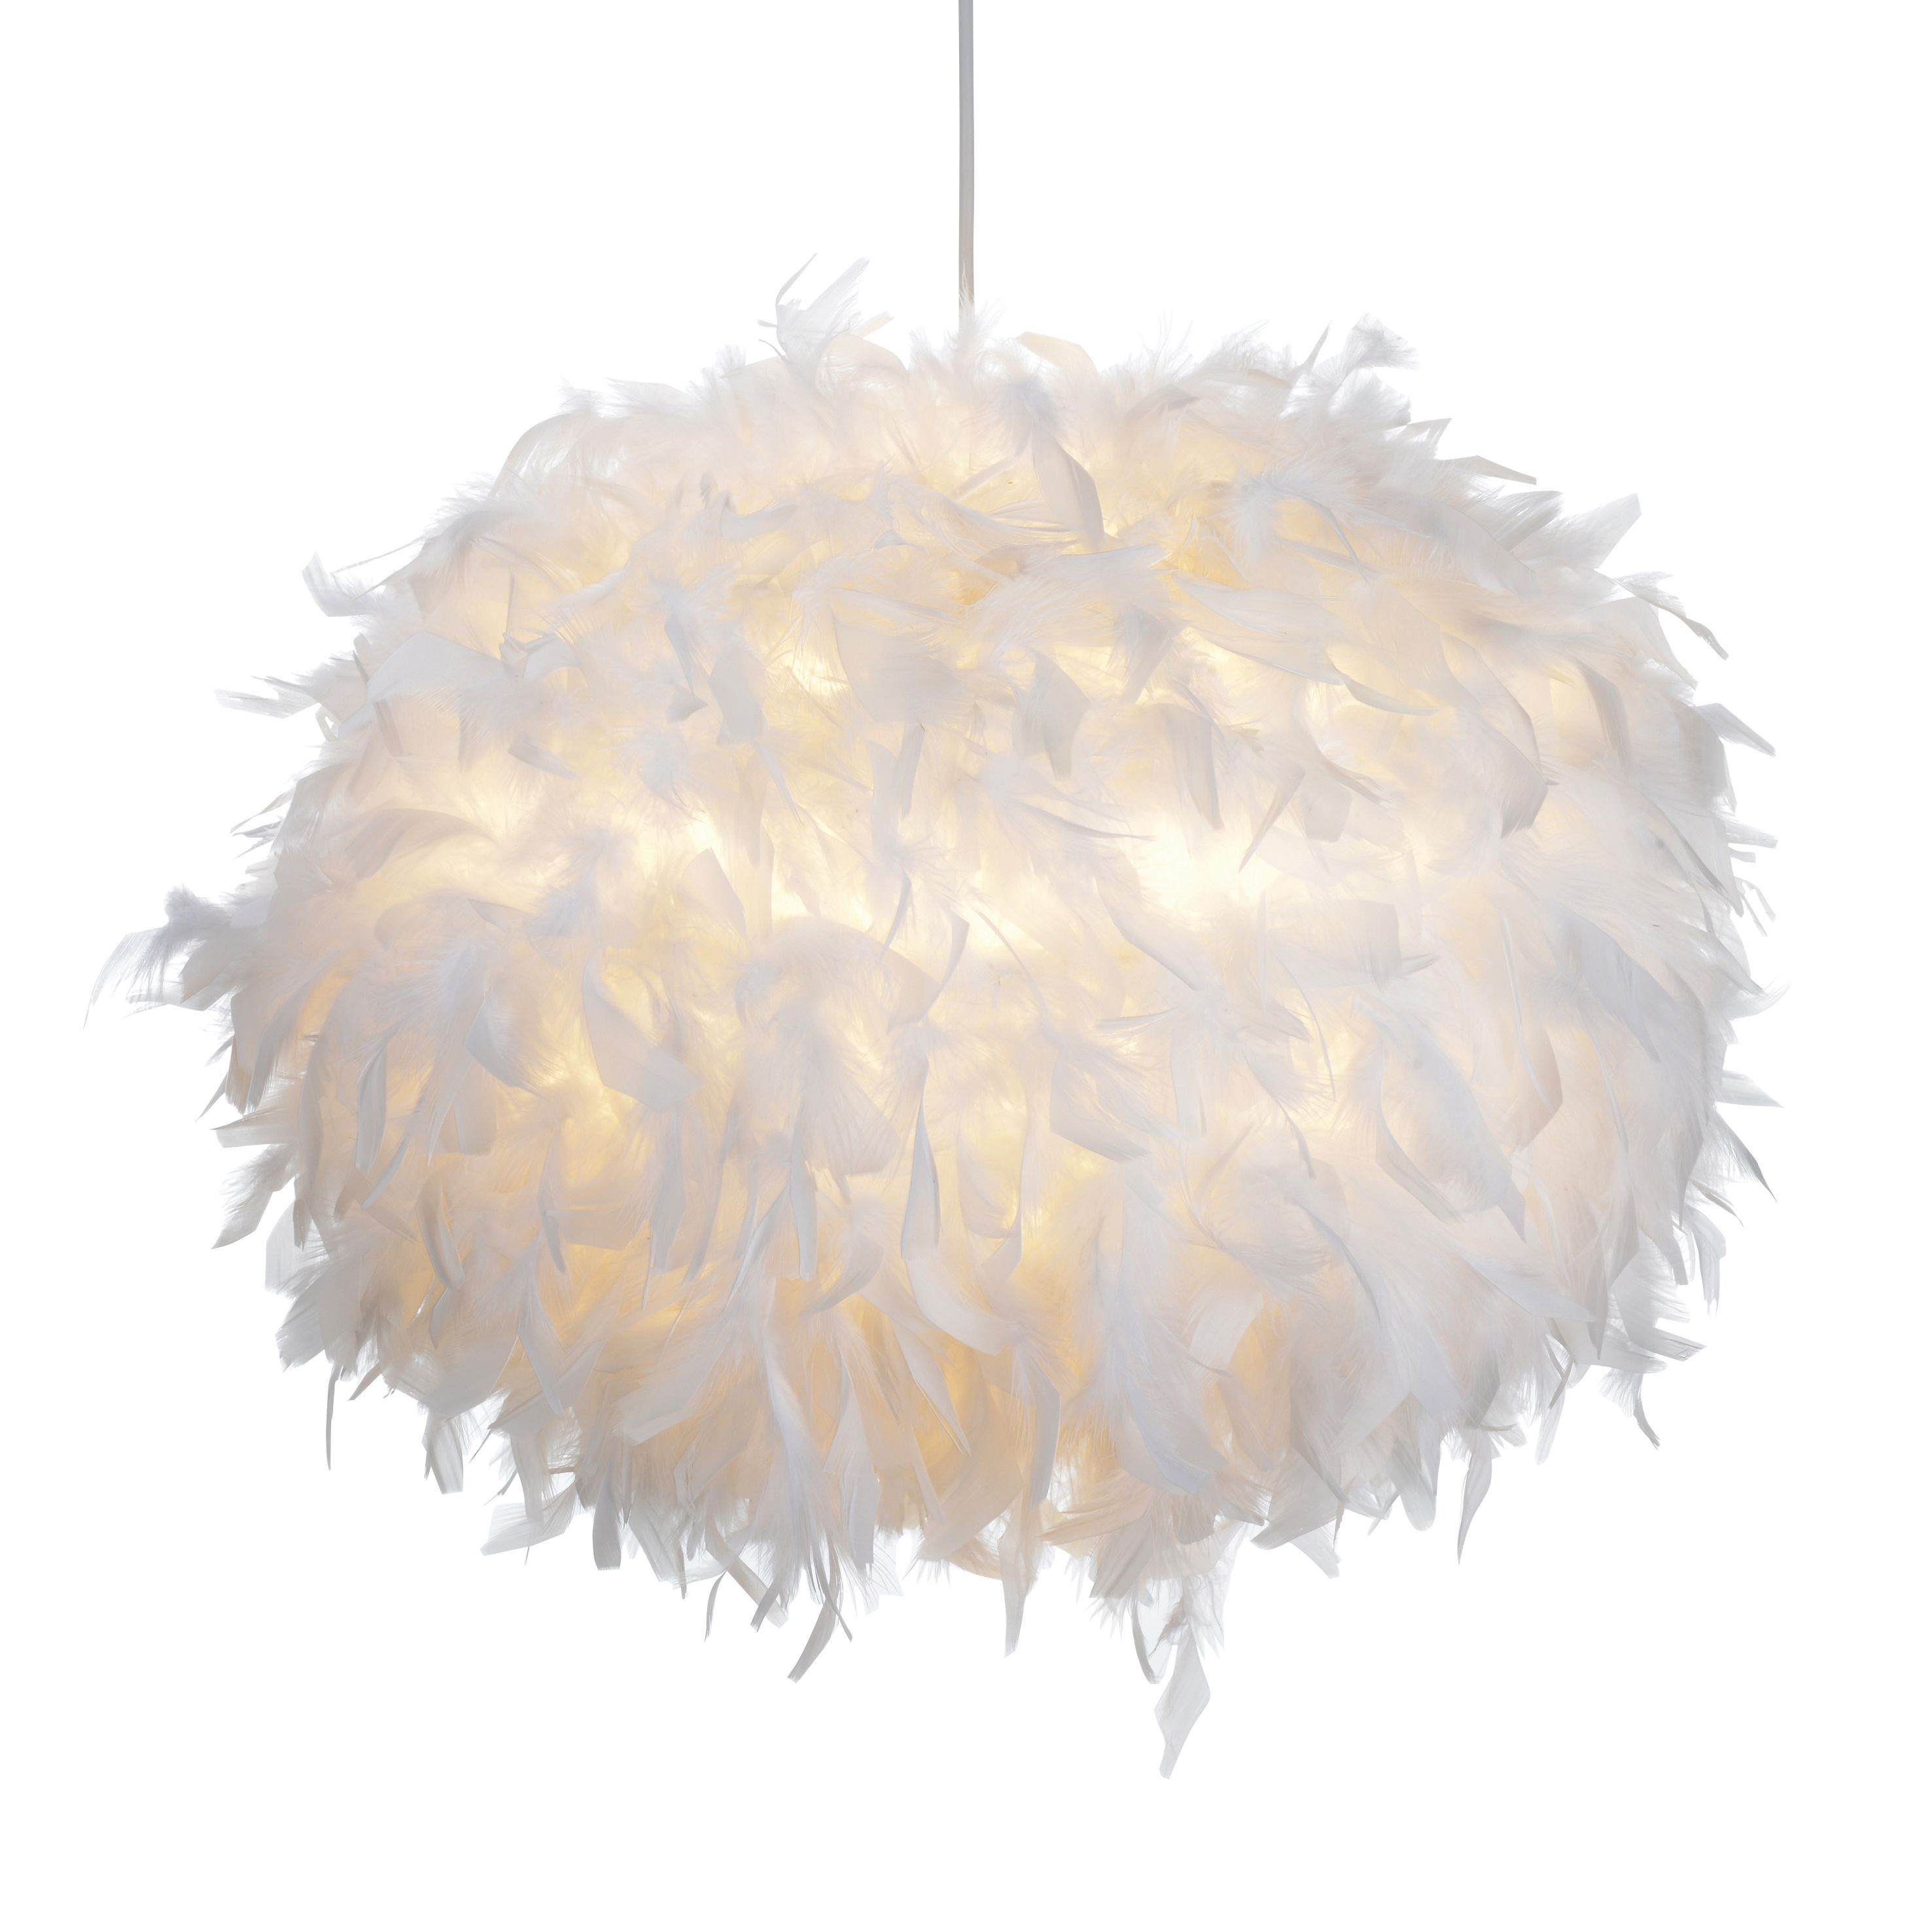 Feathered Lamp Shade